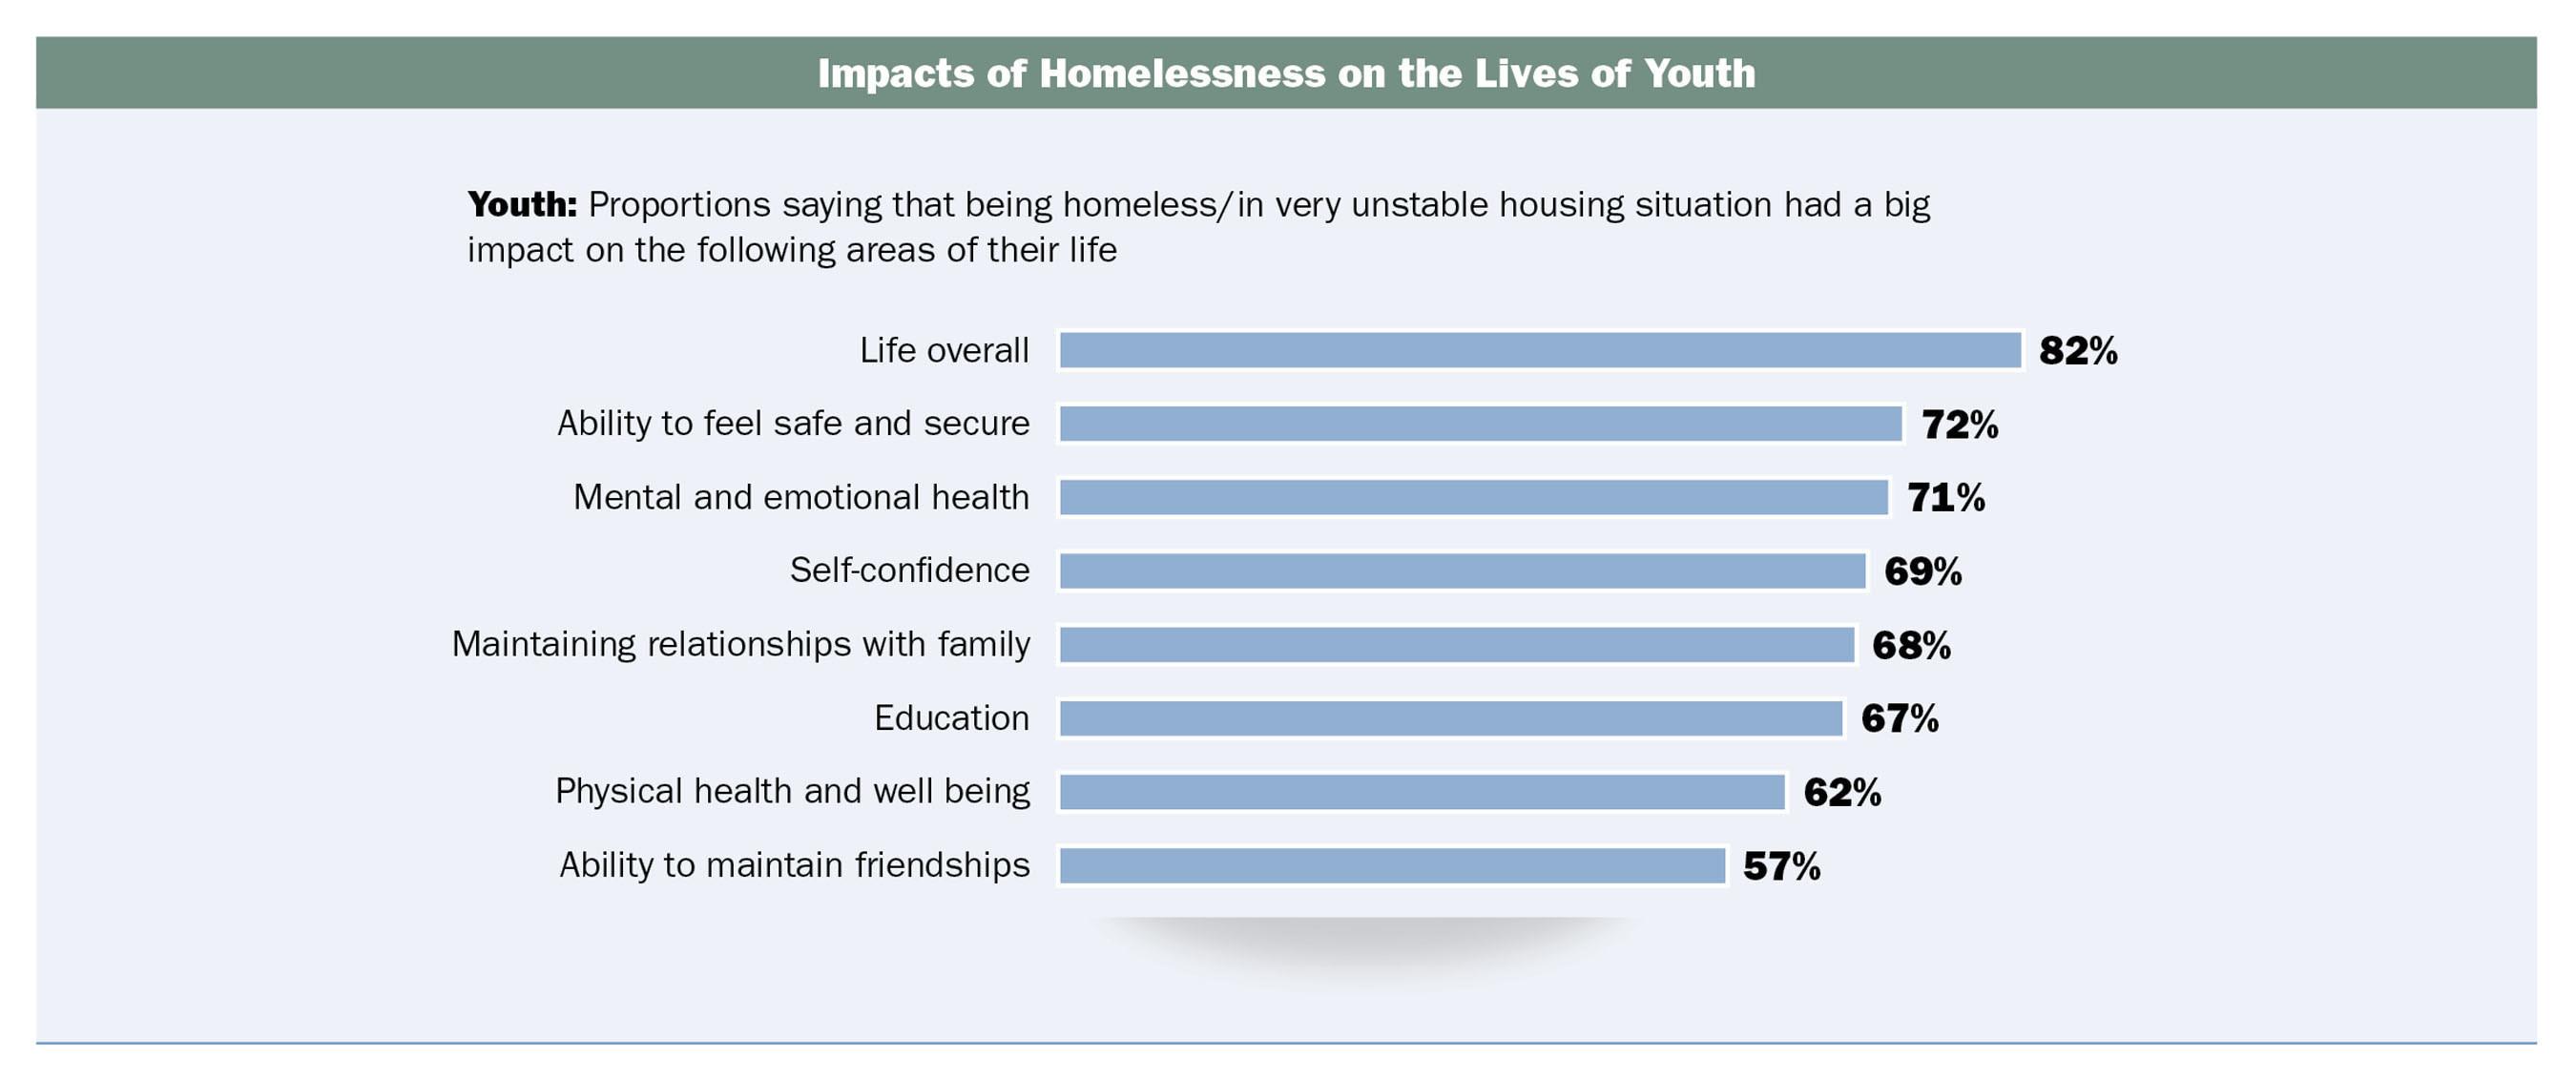 Source: Hidden in Plain Sight: Homeless Students in America's Public Schools